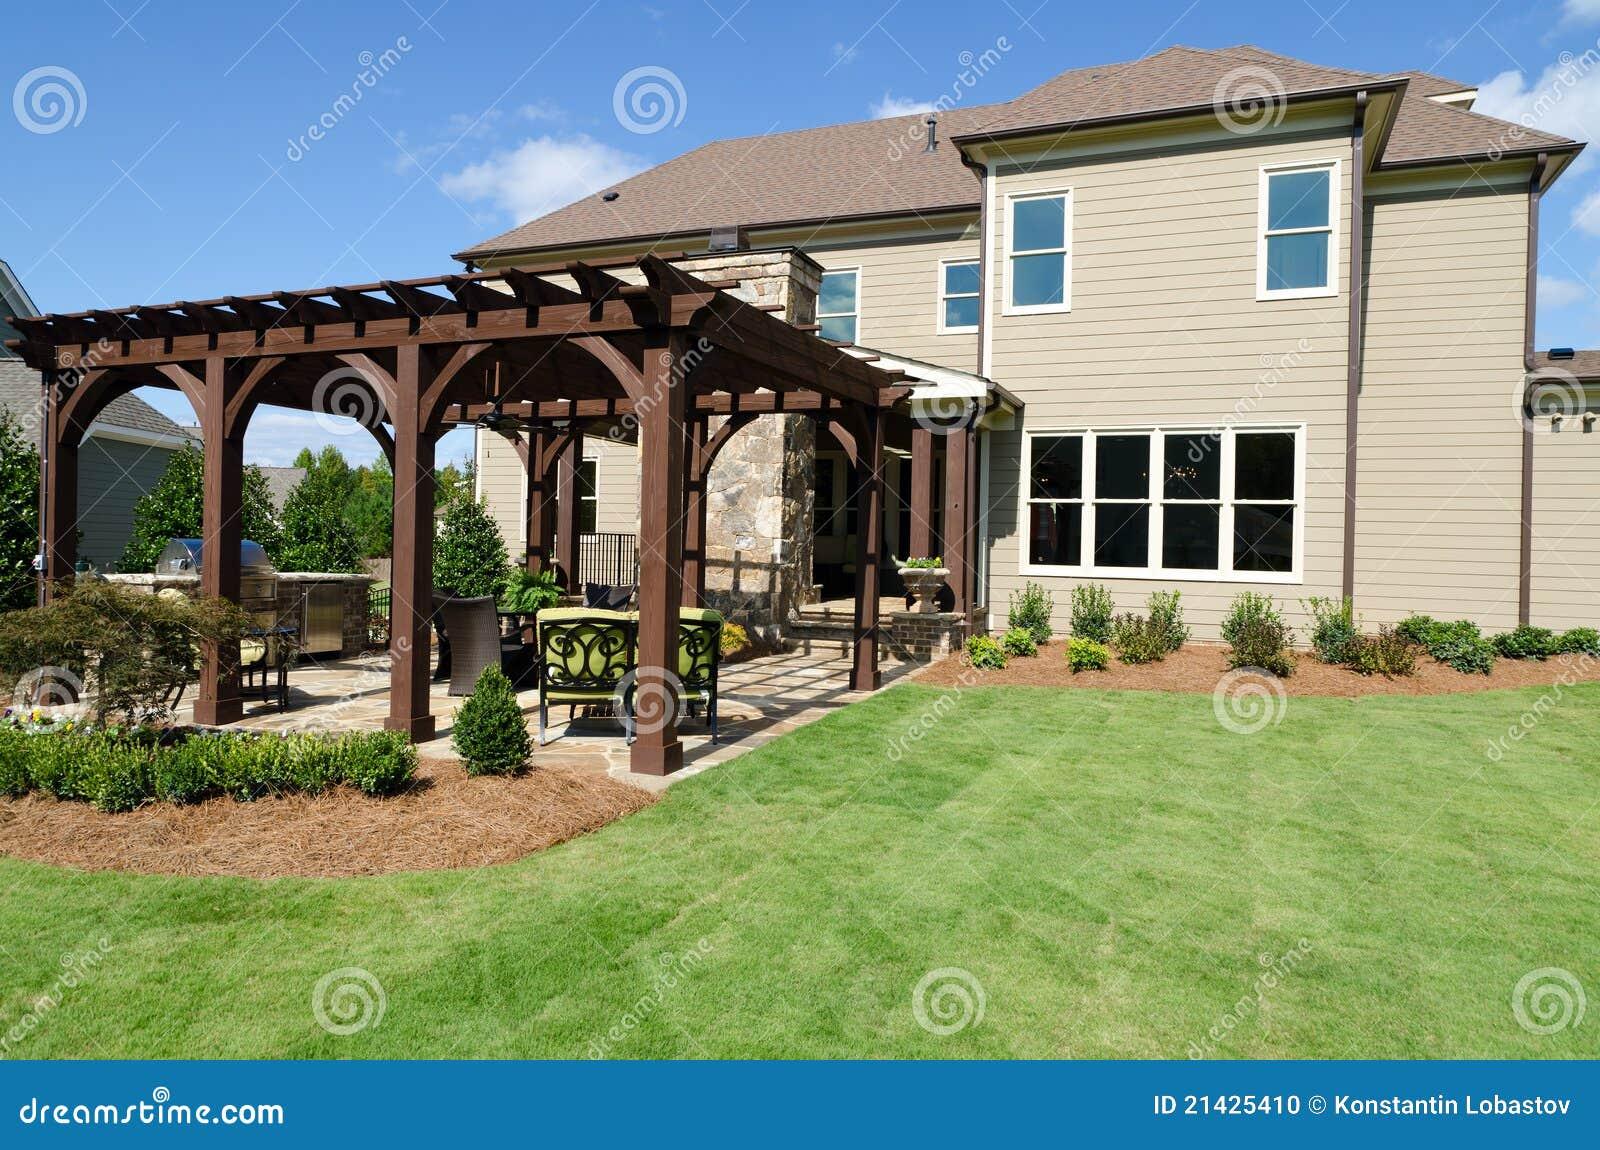 garden design garden design with lighted pergola with privacy